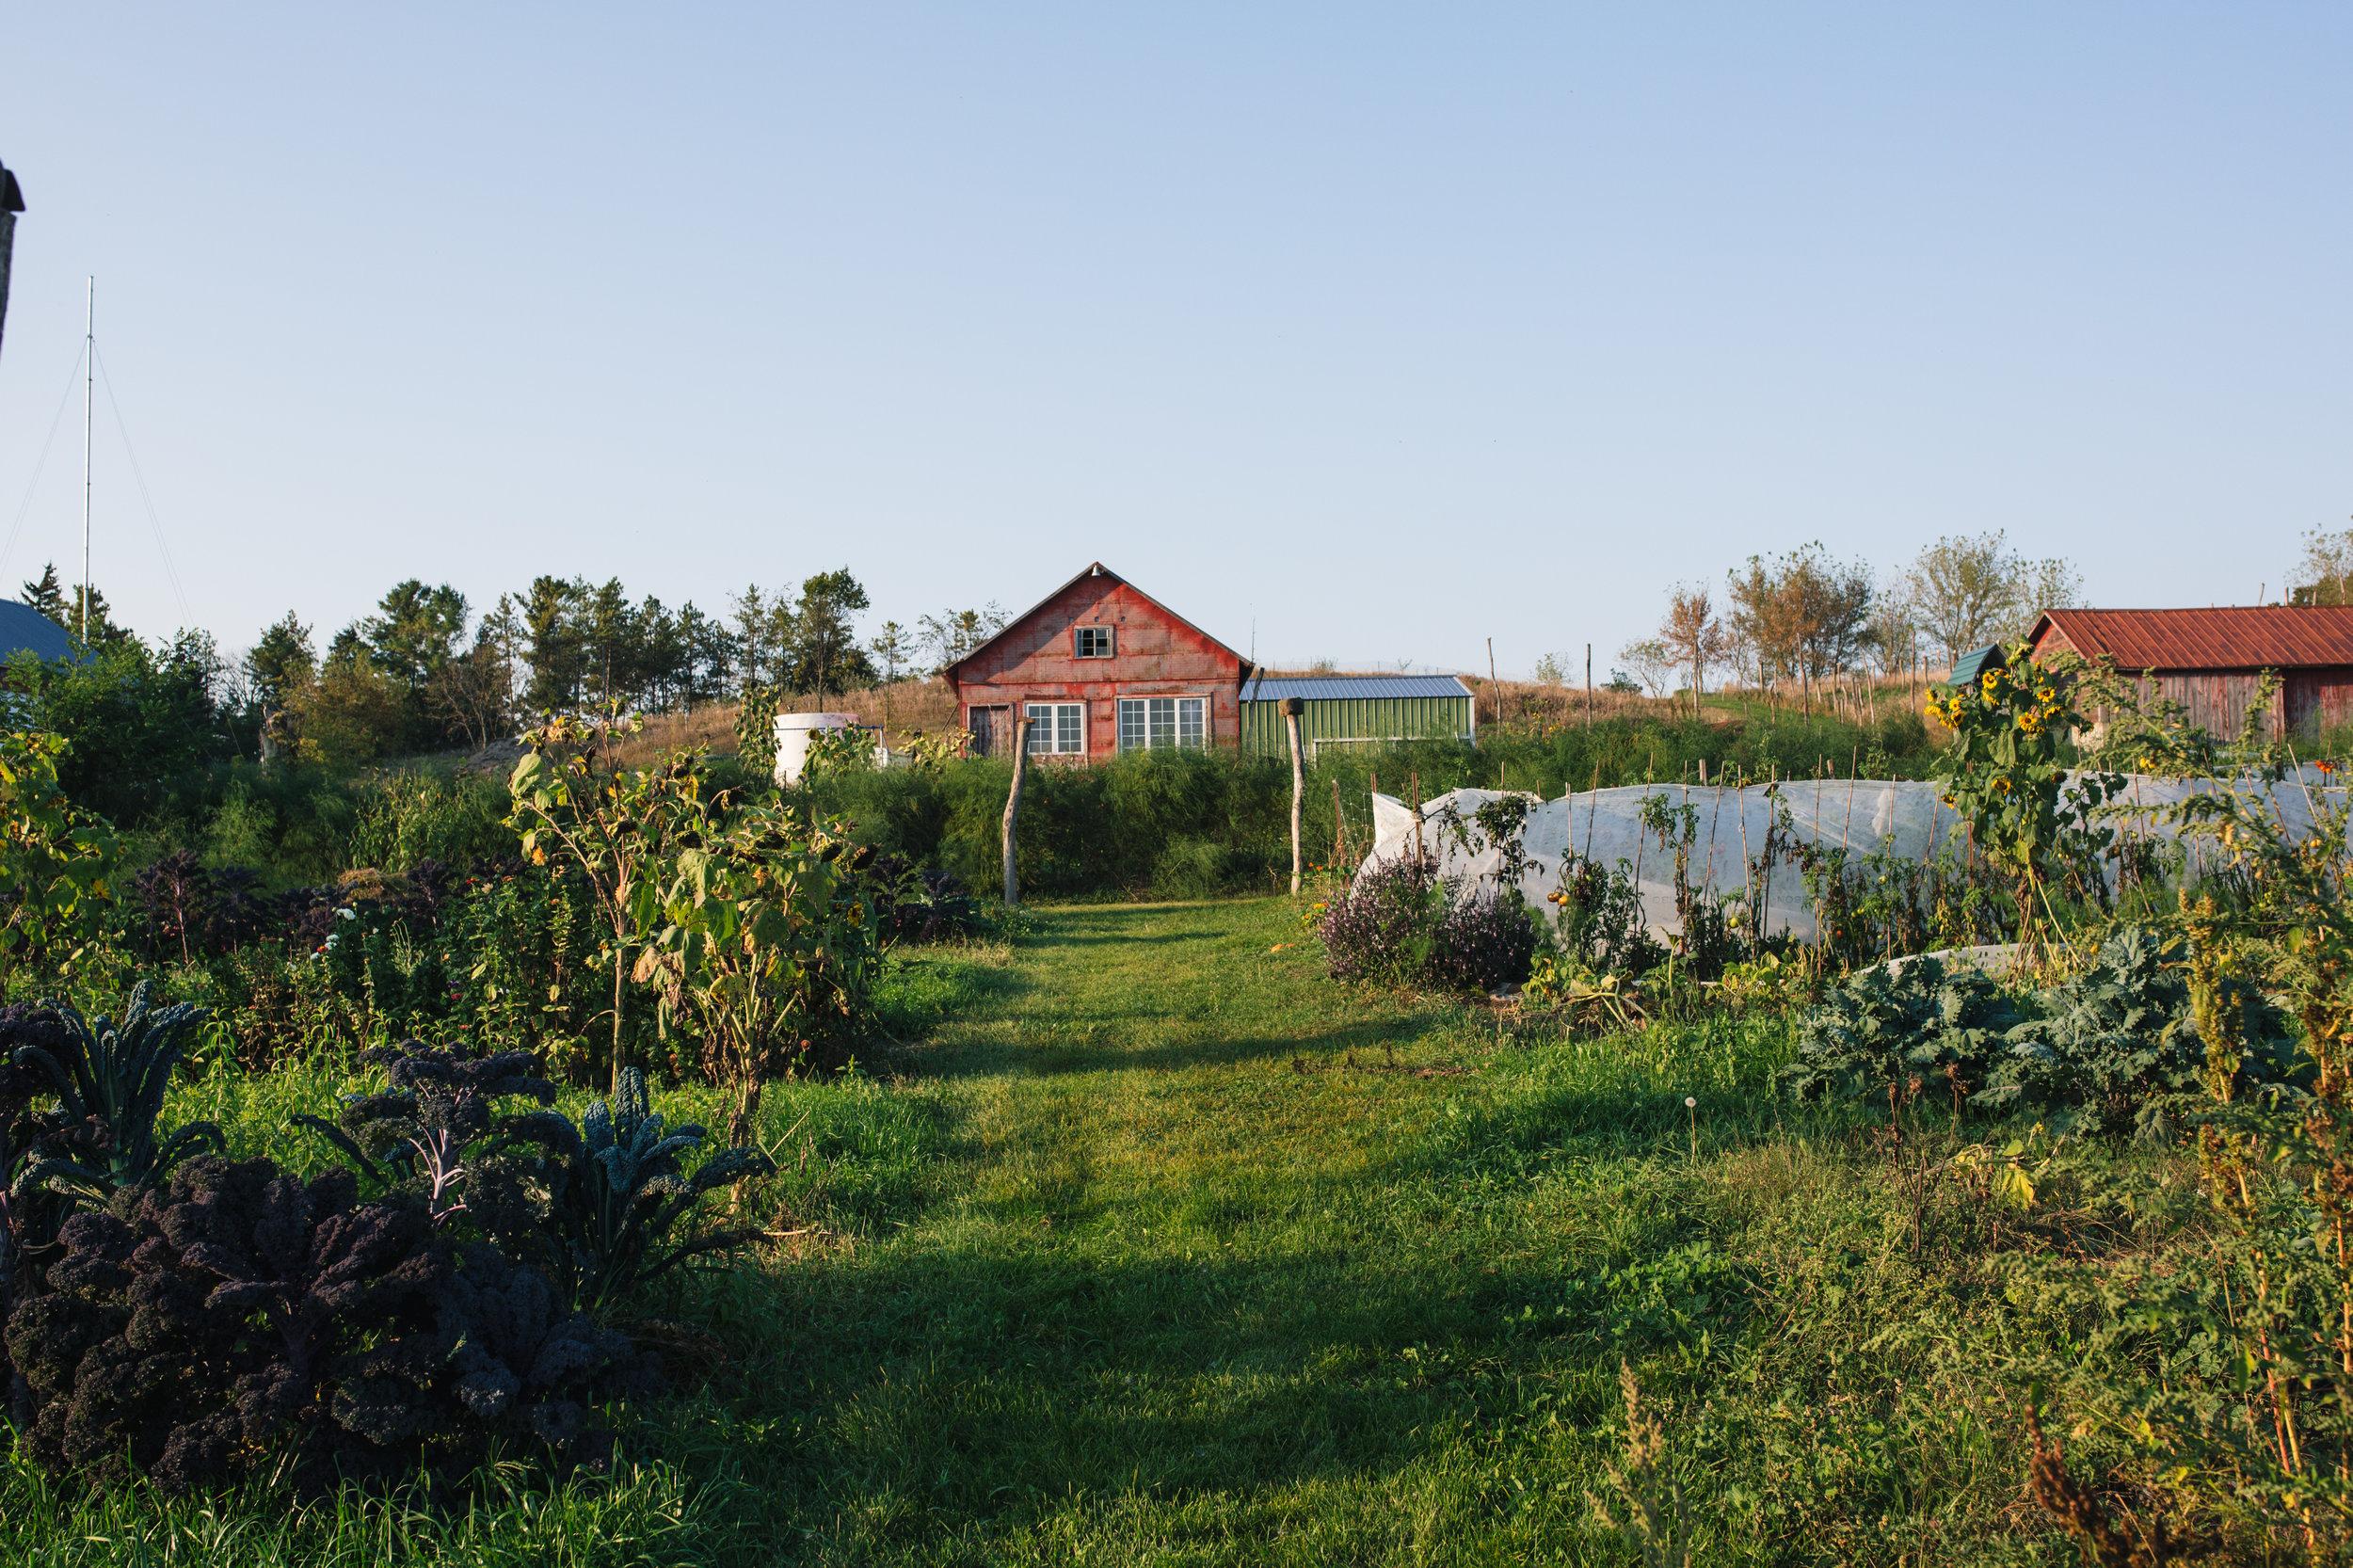 Rustic Barn and Organic Farm Wedding Venue Outside Milwaukee, WI